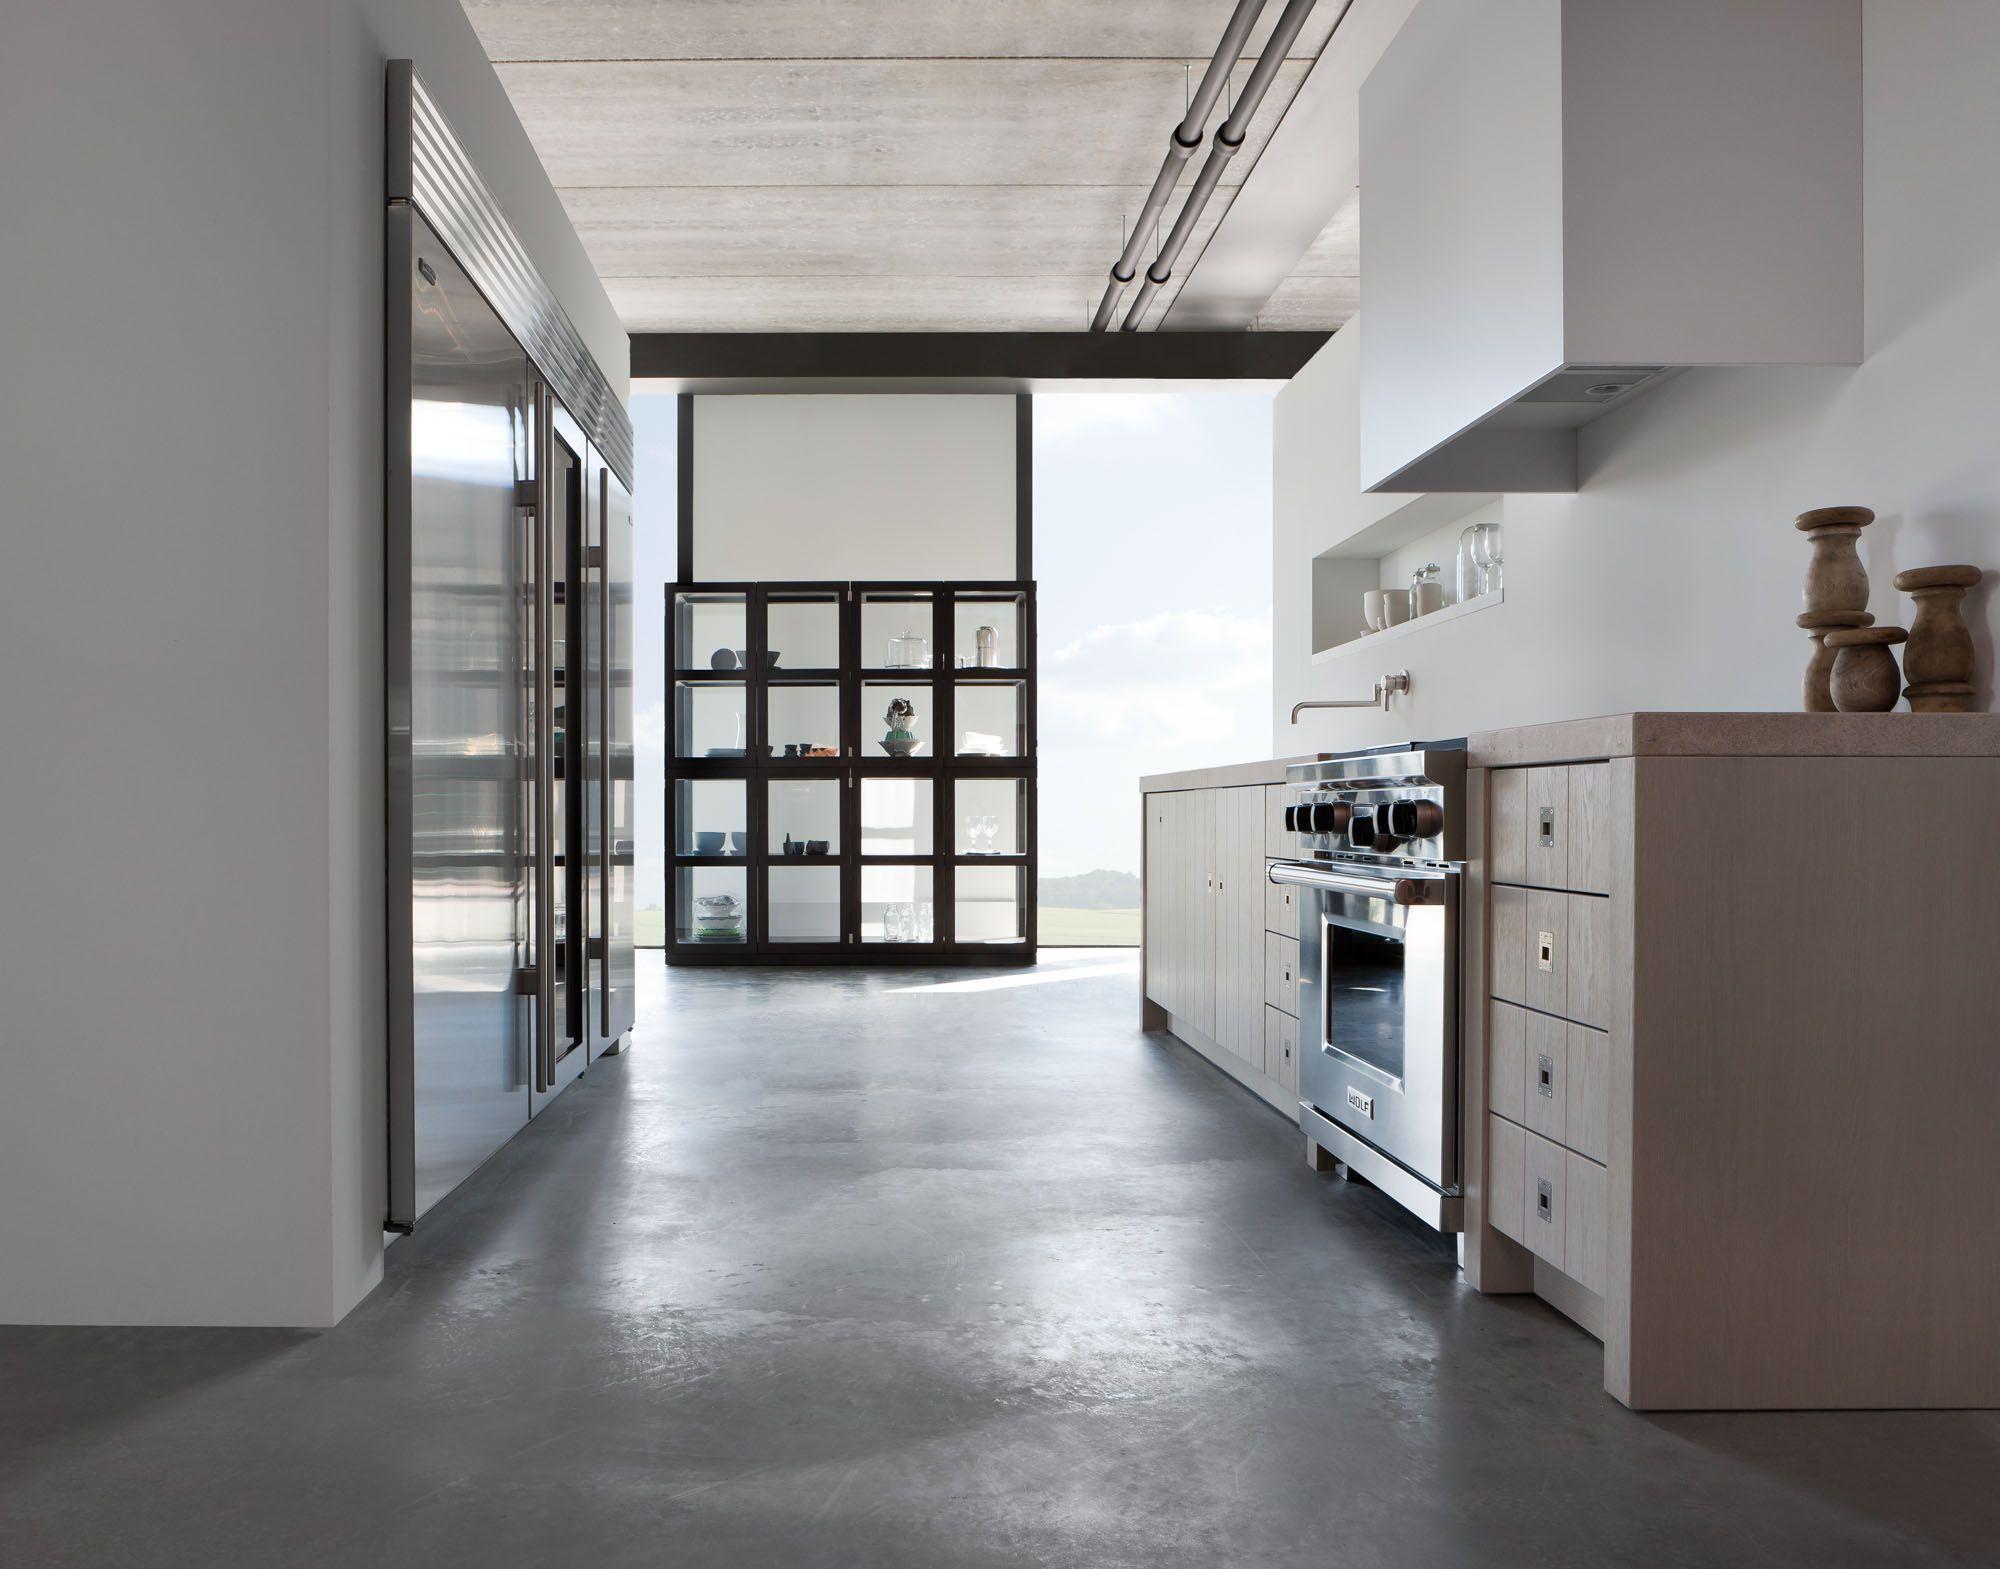 Studio Piet Boon lanceert keukenlijn, Piet Boon Kitchen